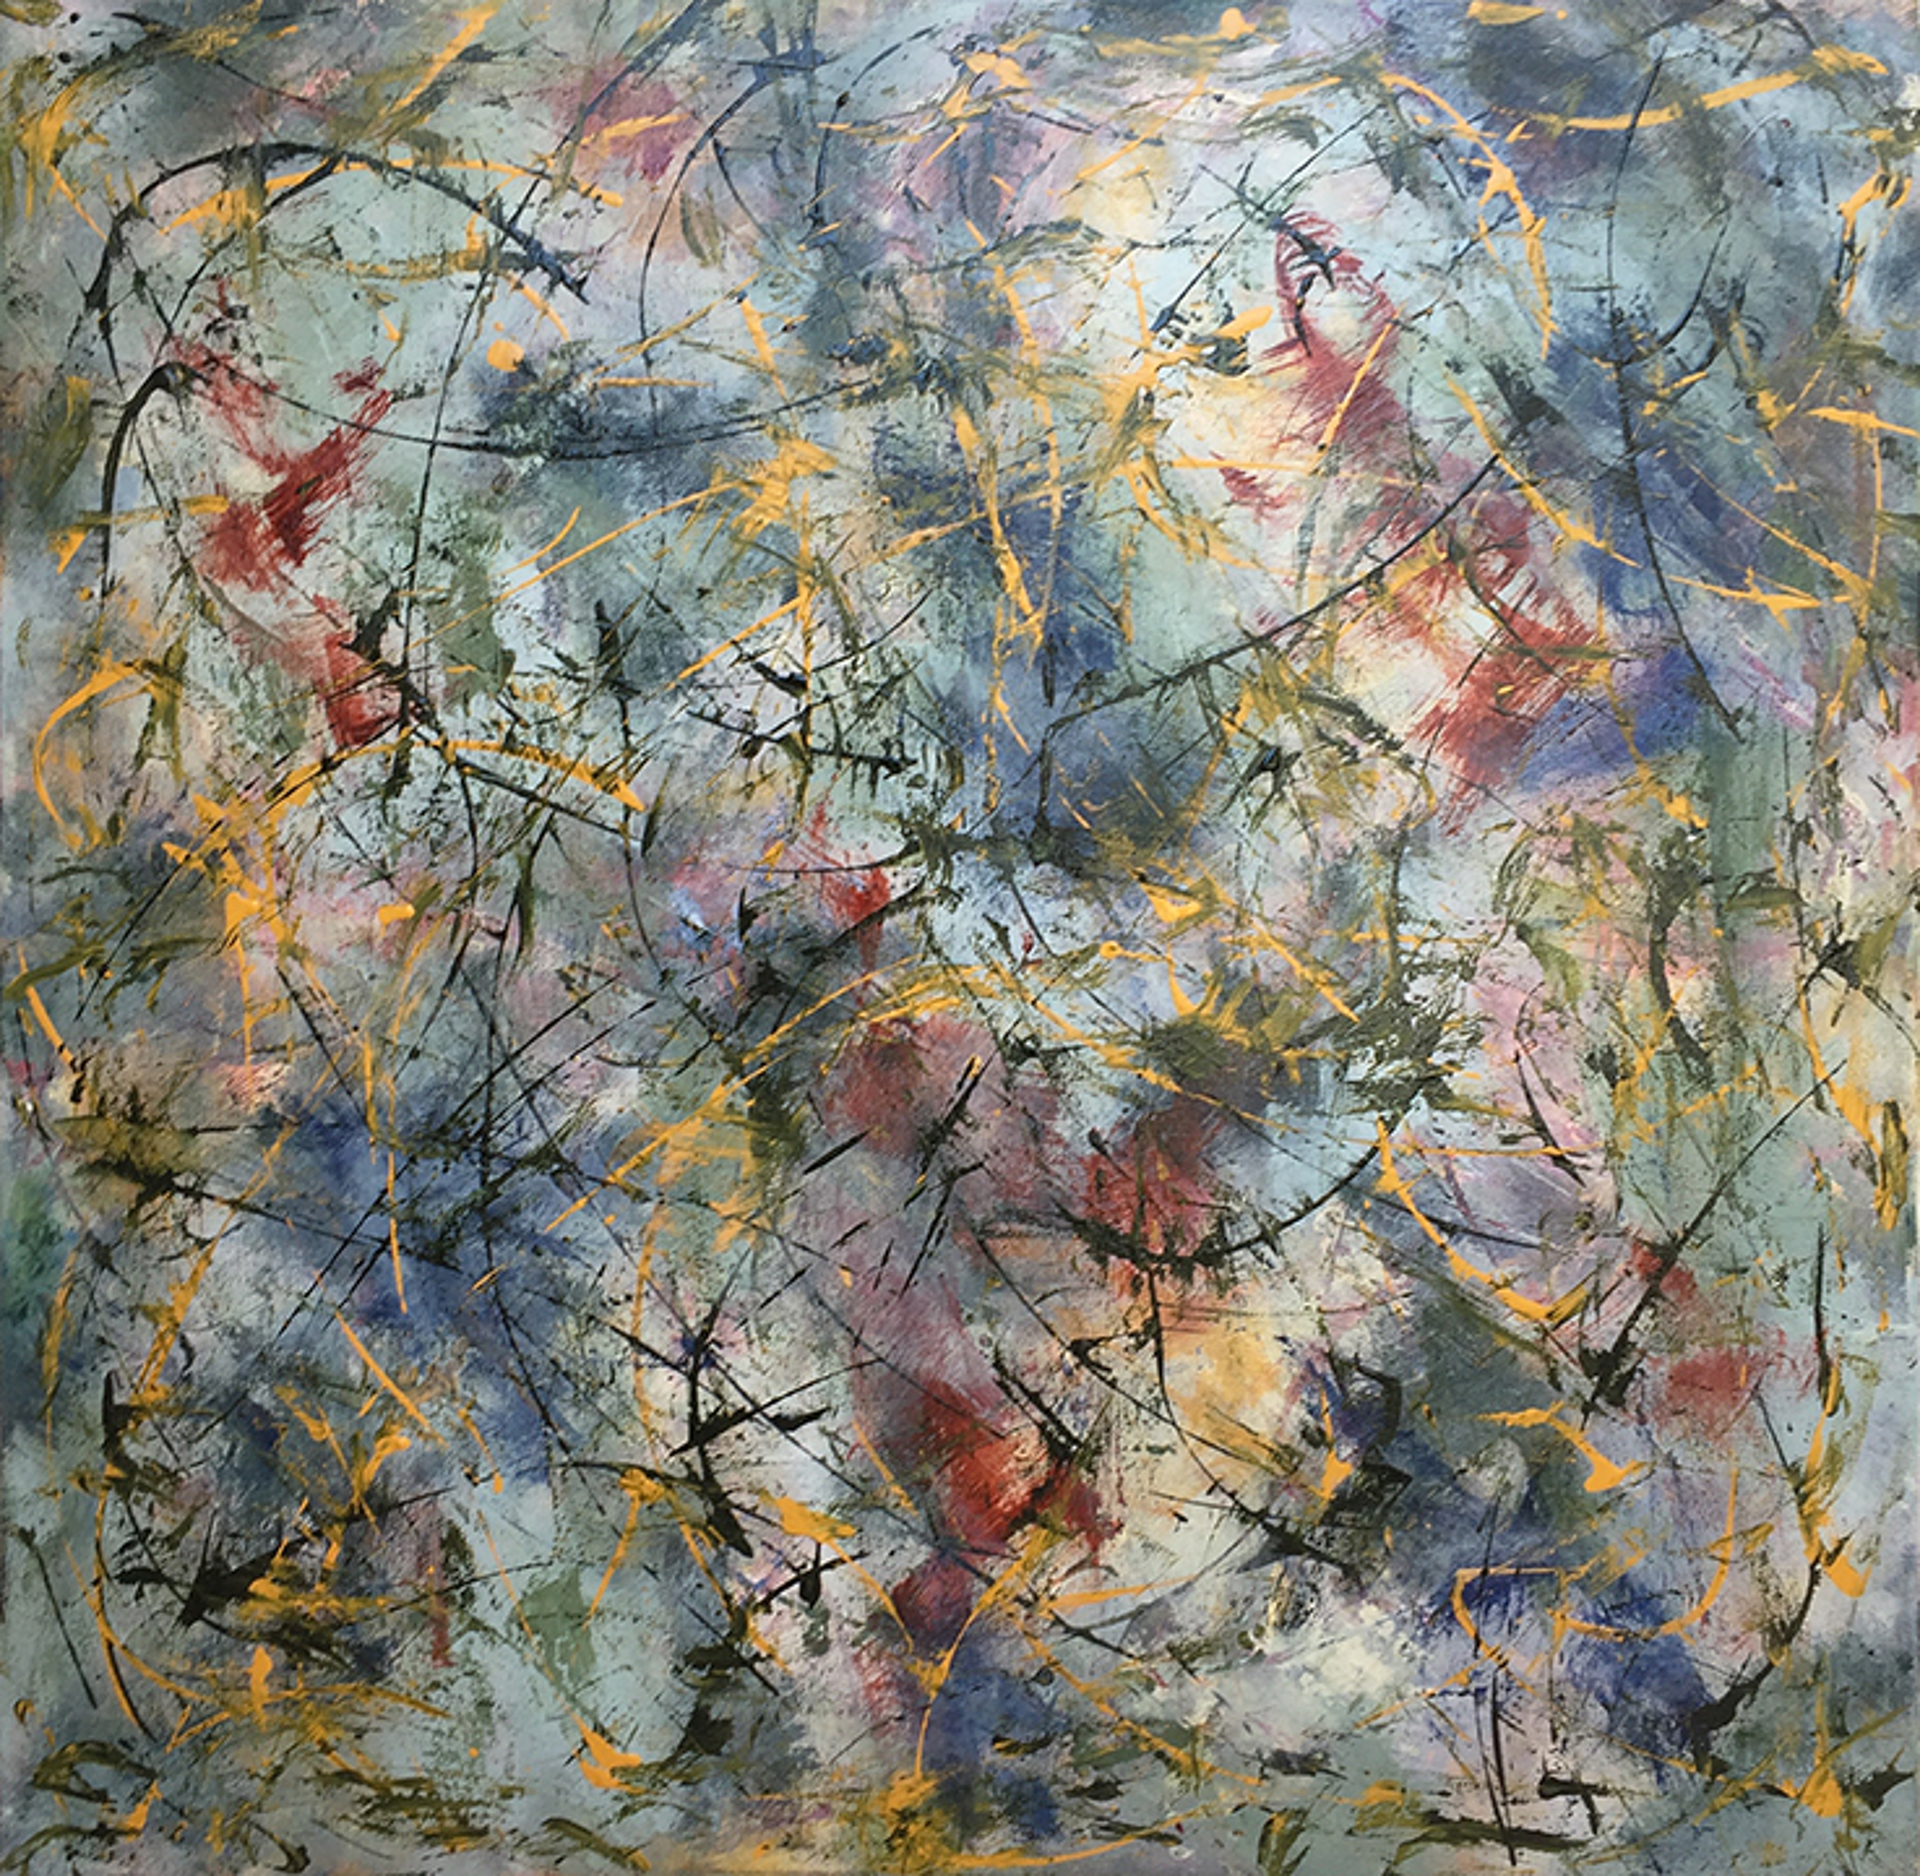 Coniferous by David Skillicorn